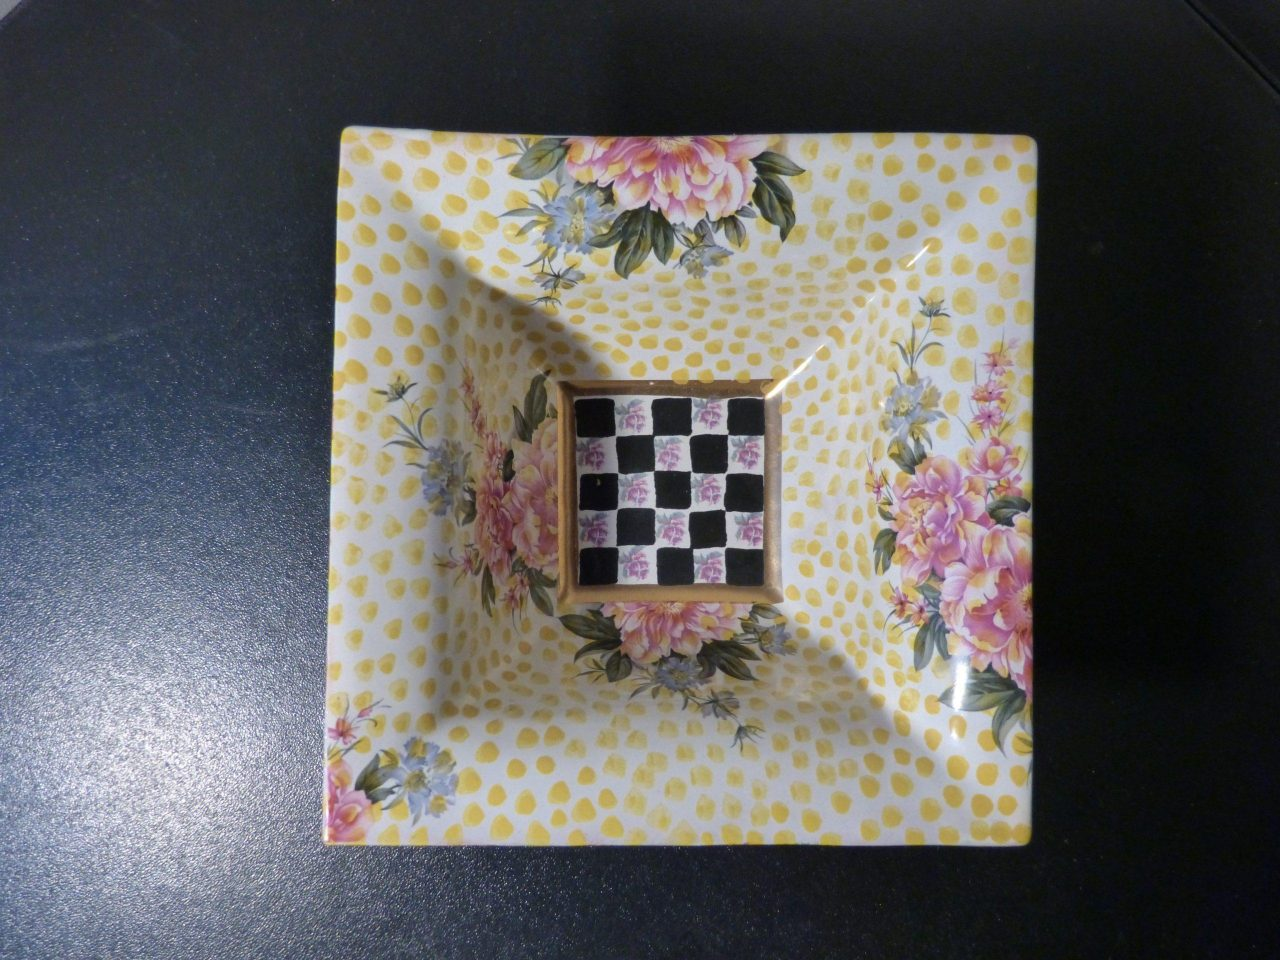 Mackenzie Childs Torquay Buttercup Kelp & Urchin Square Bowl